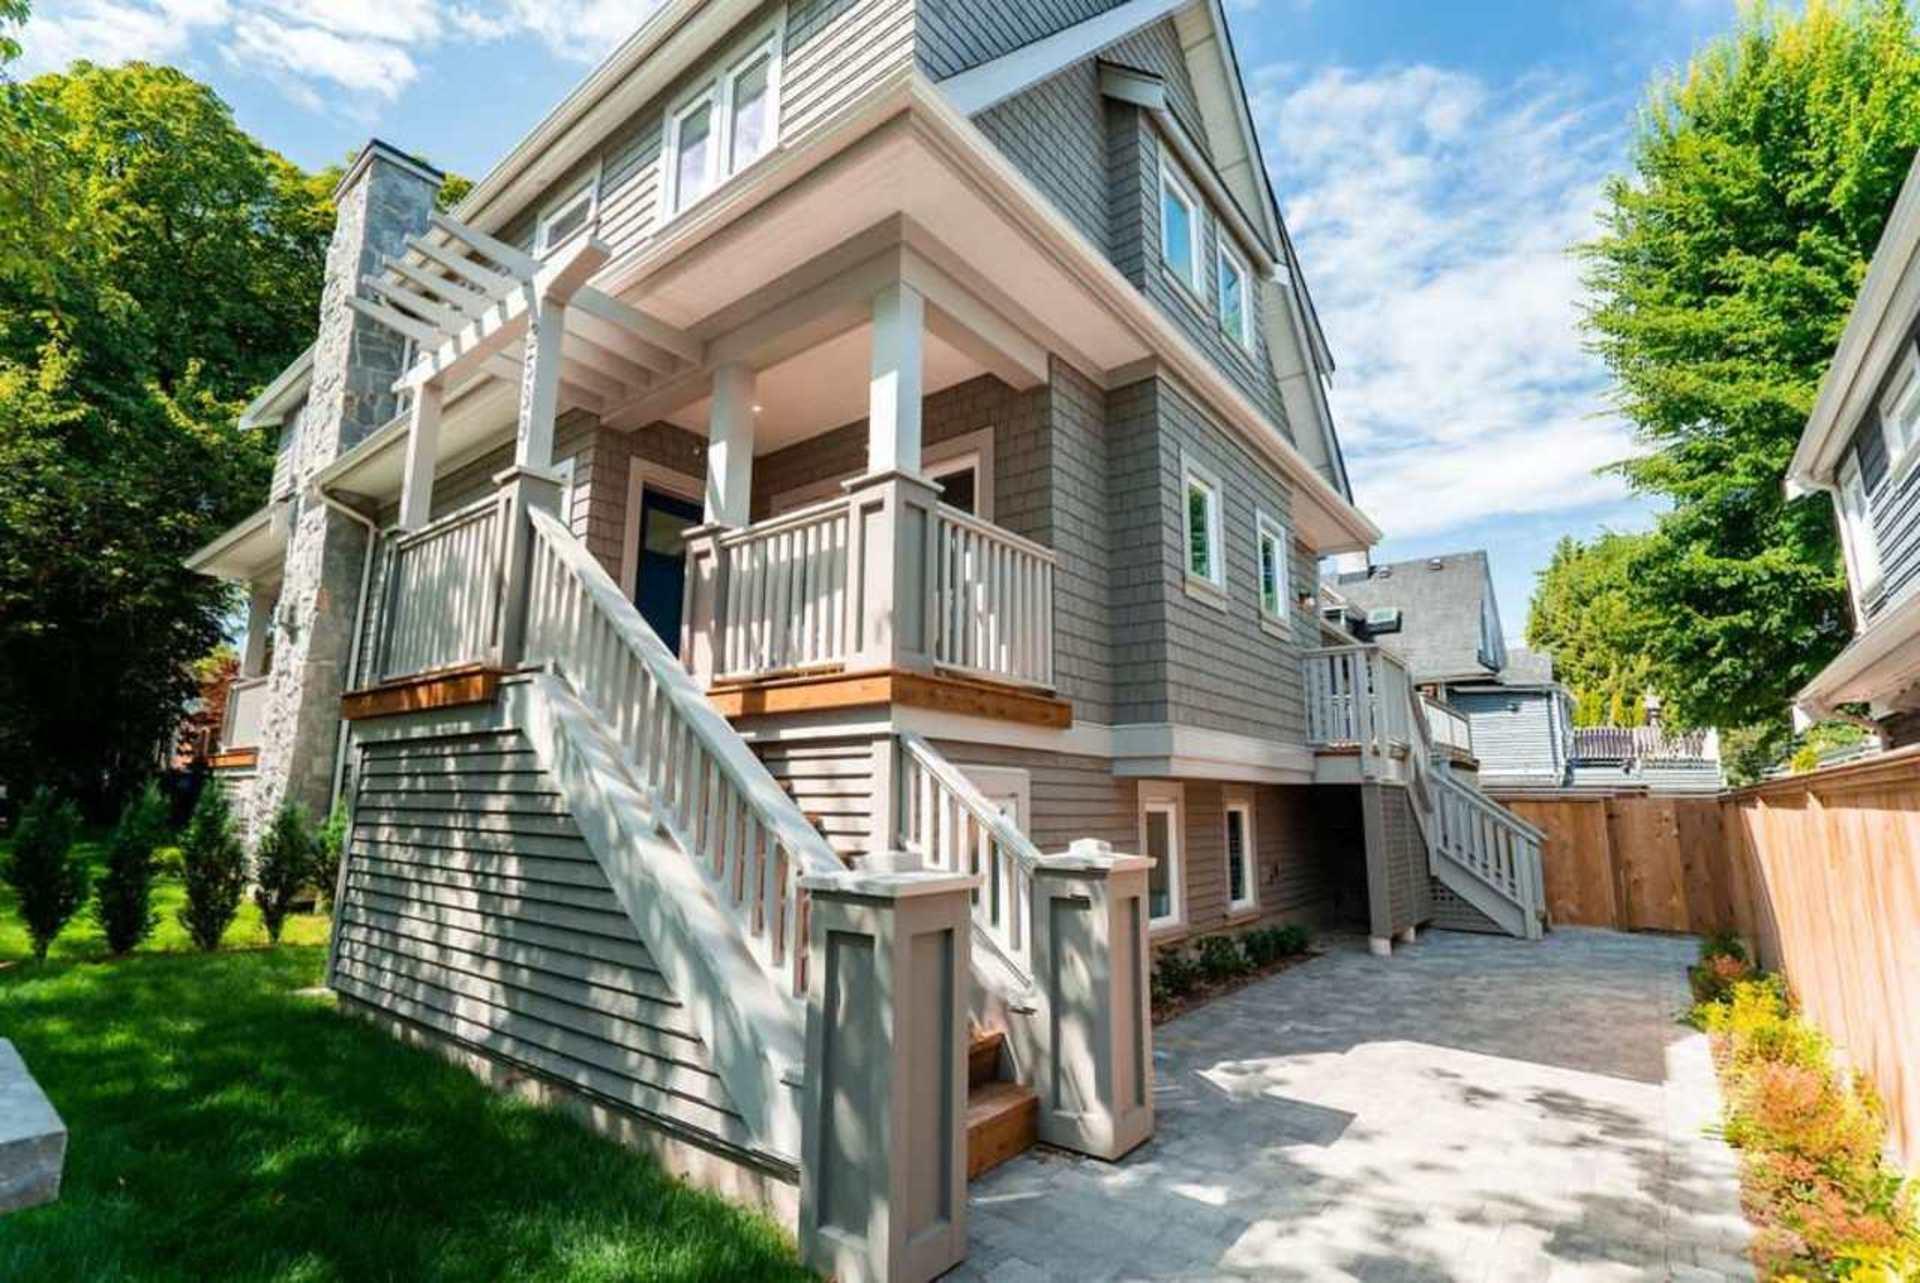 2599-stgeorge-street-mount-pleasant-ve-vancouver-east-20 at 2599 St.george Street, Mount Pleasant VE, Vancouver East